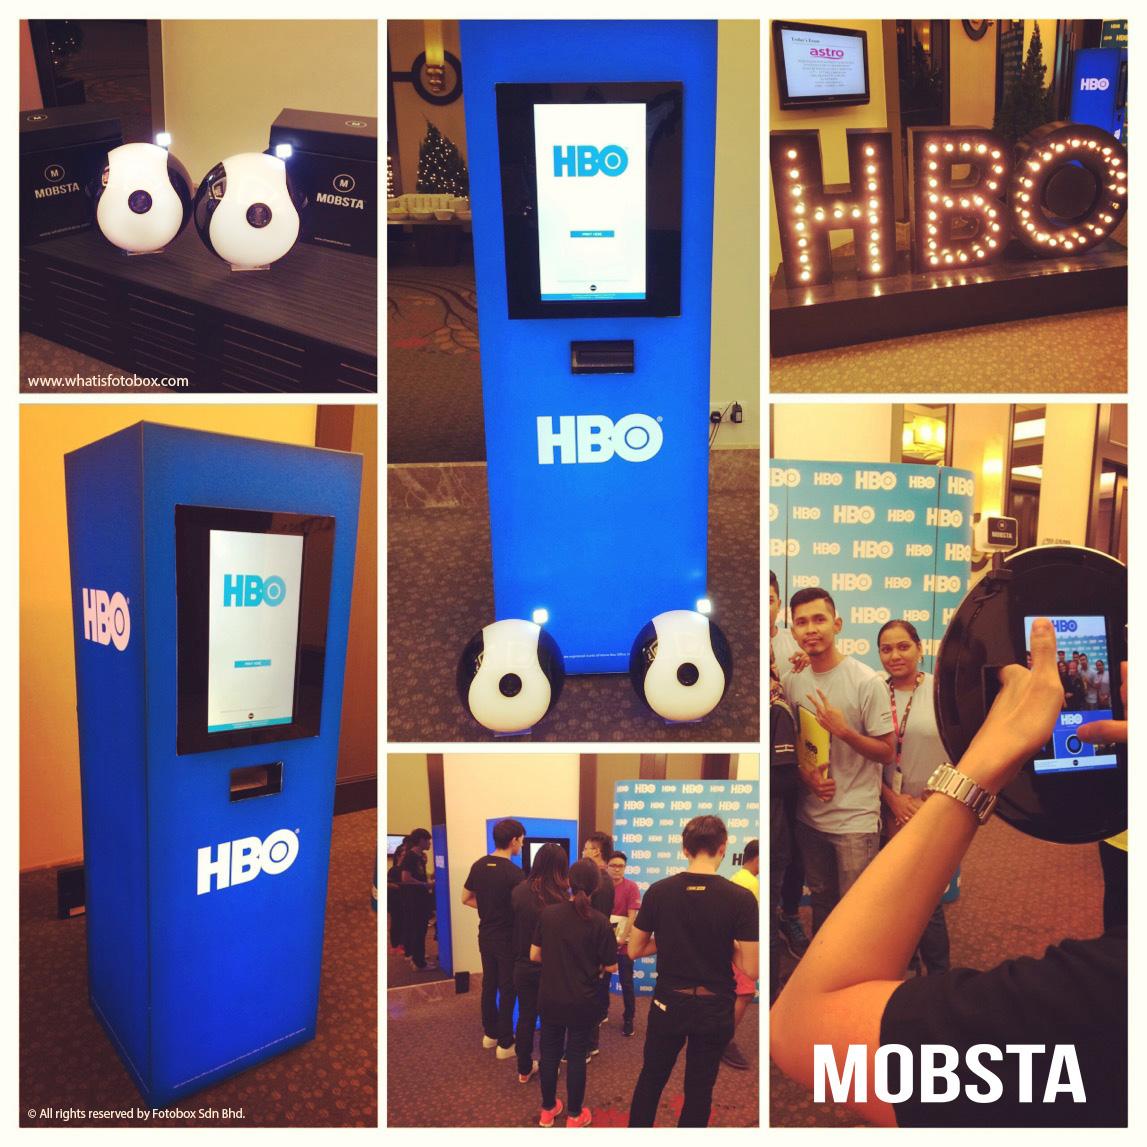 HBO Mobsta.jpg